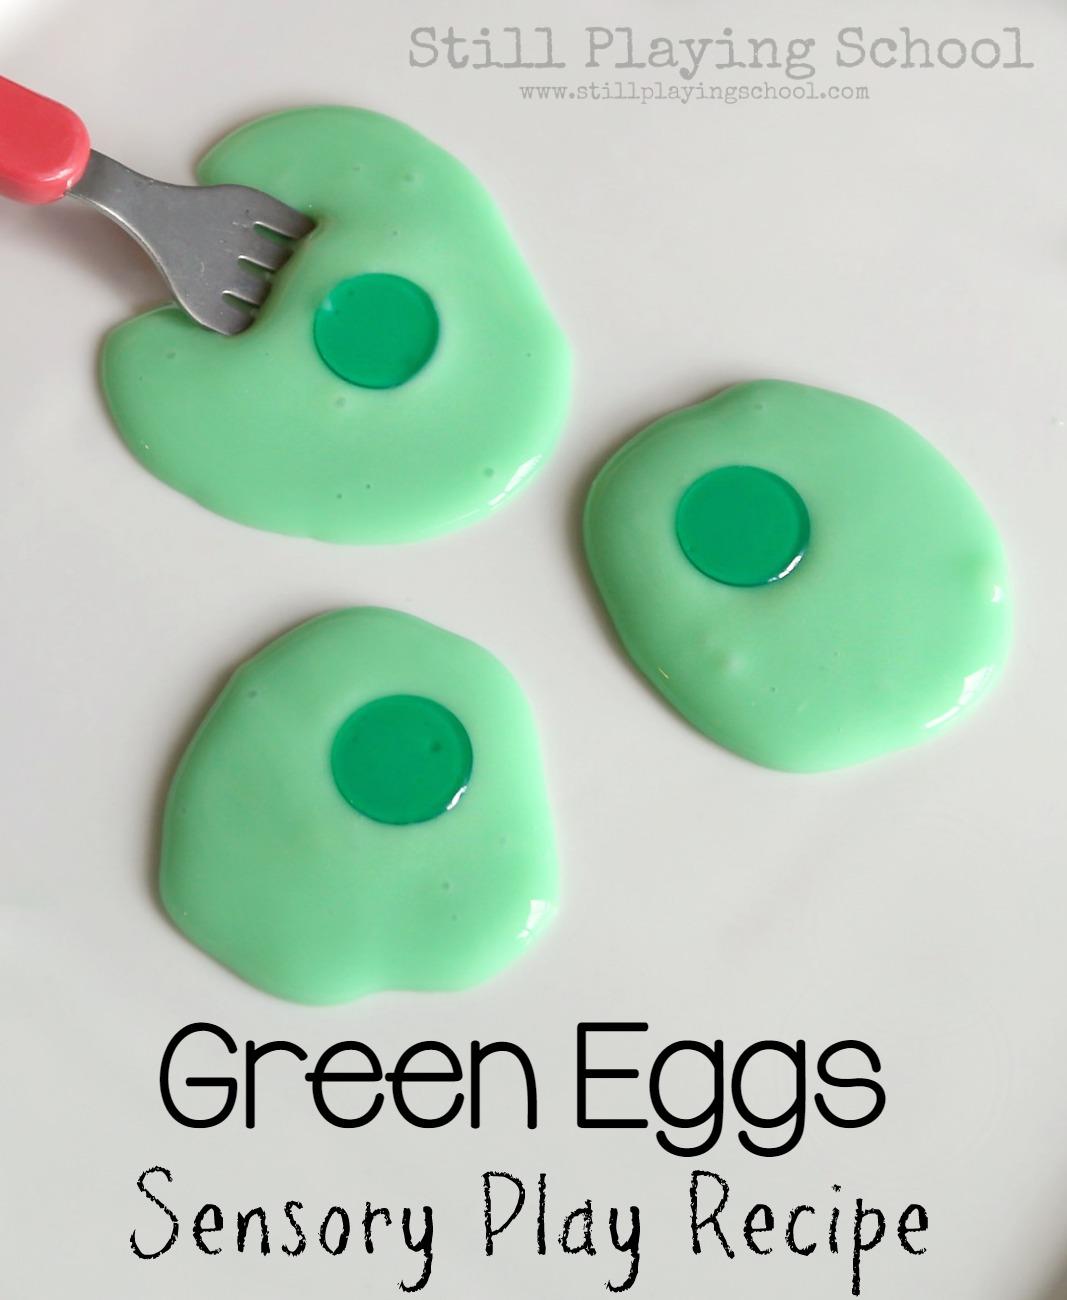 Green Eggs Sensory Play